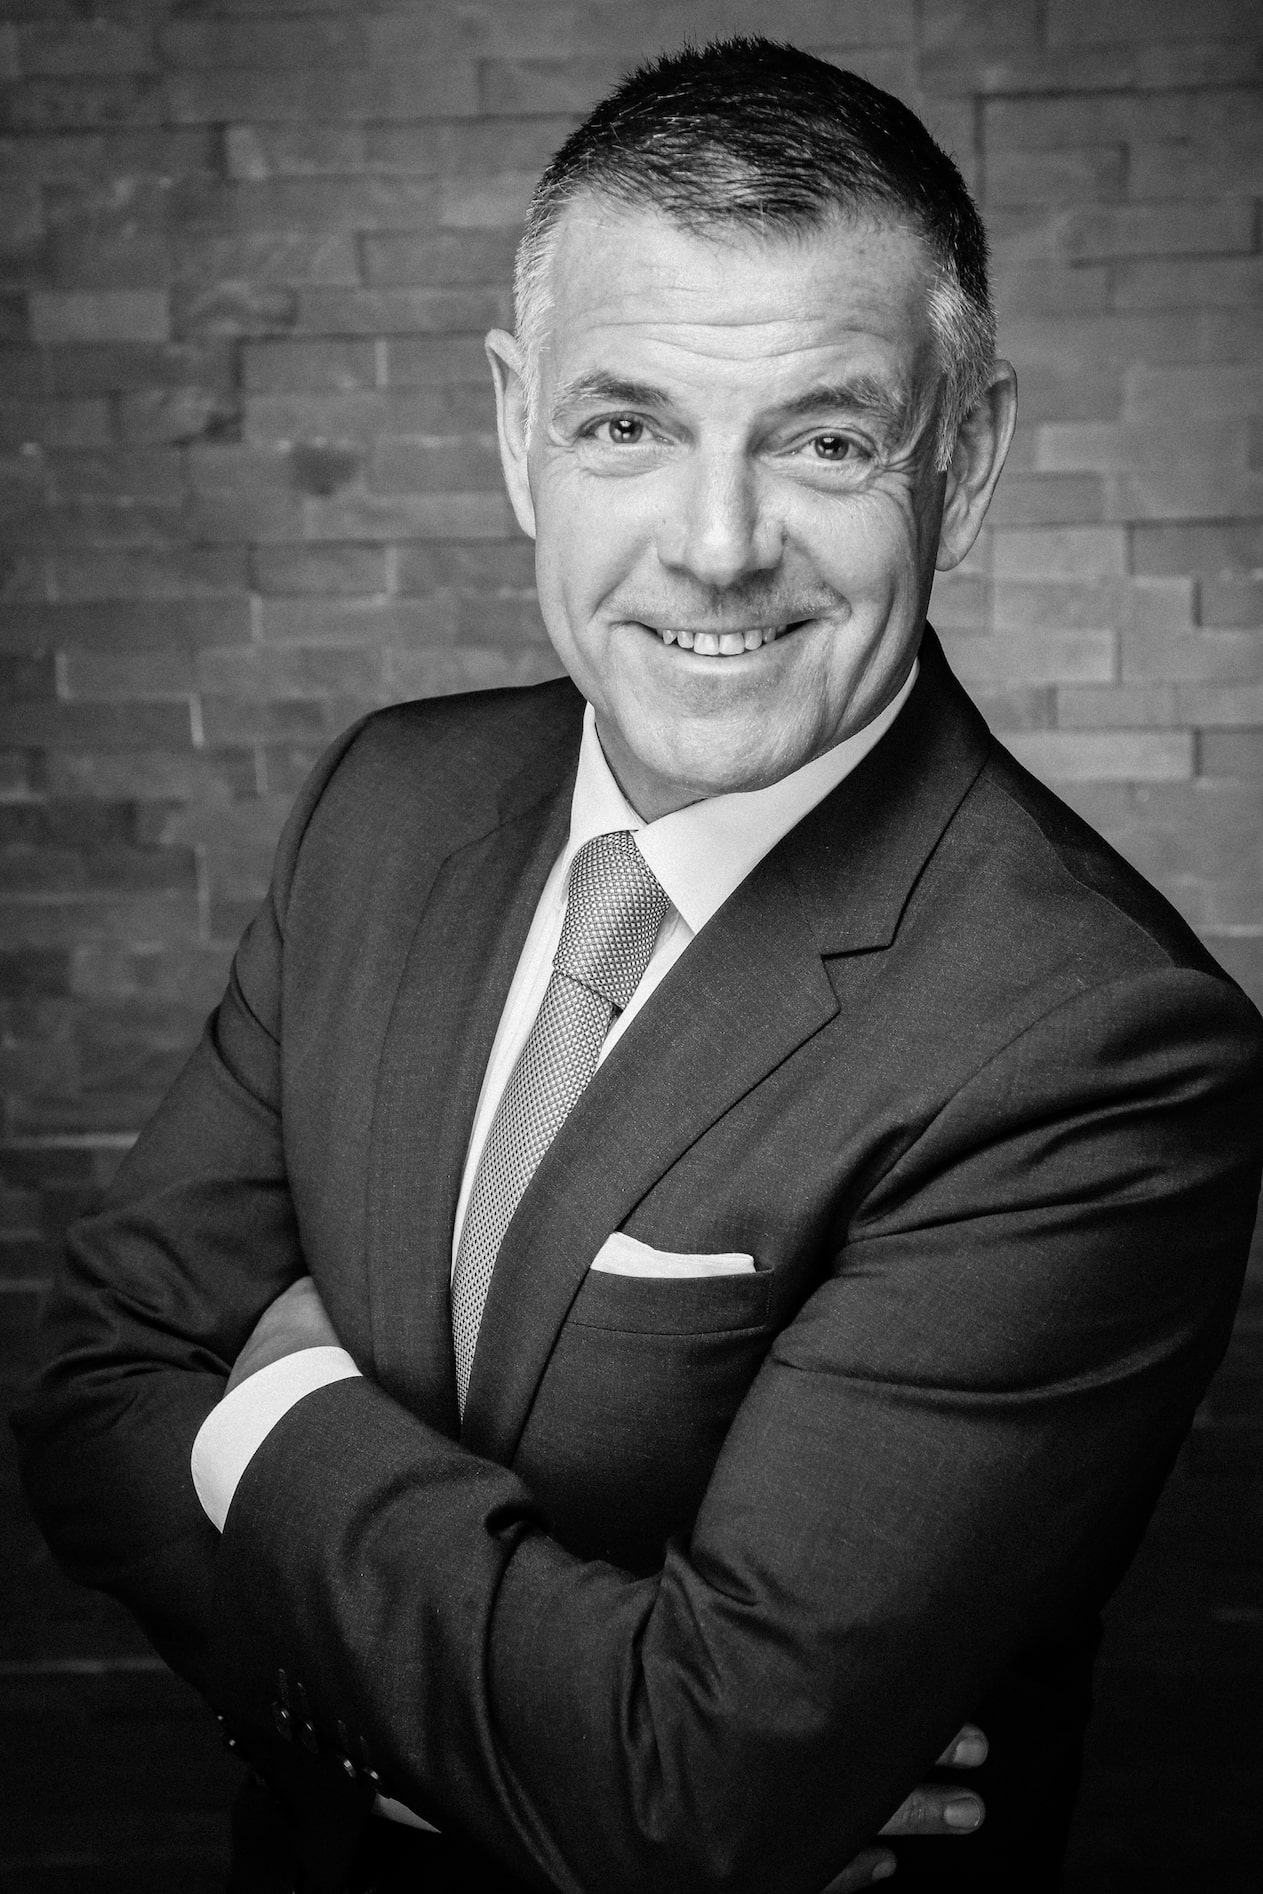 https://intelligent-investors.de/wp-content/uploads/2020/06/Uwe_Diehl_Eyb_Wallwitz-min.jpg